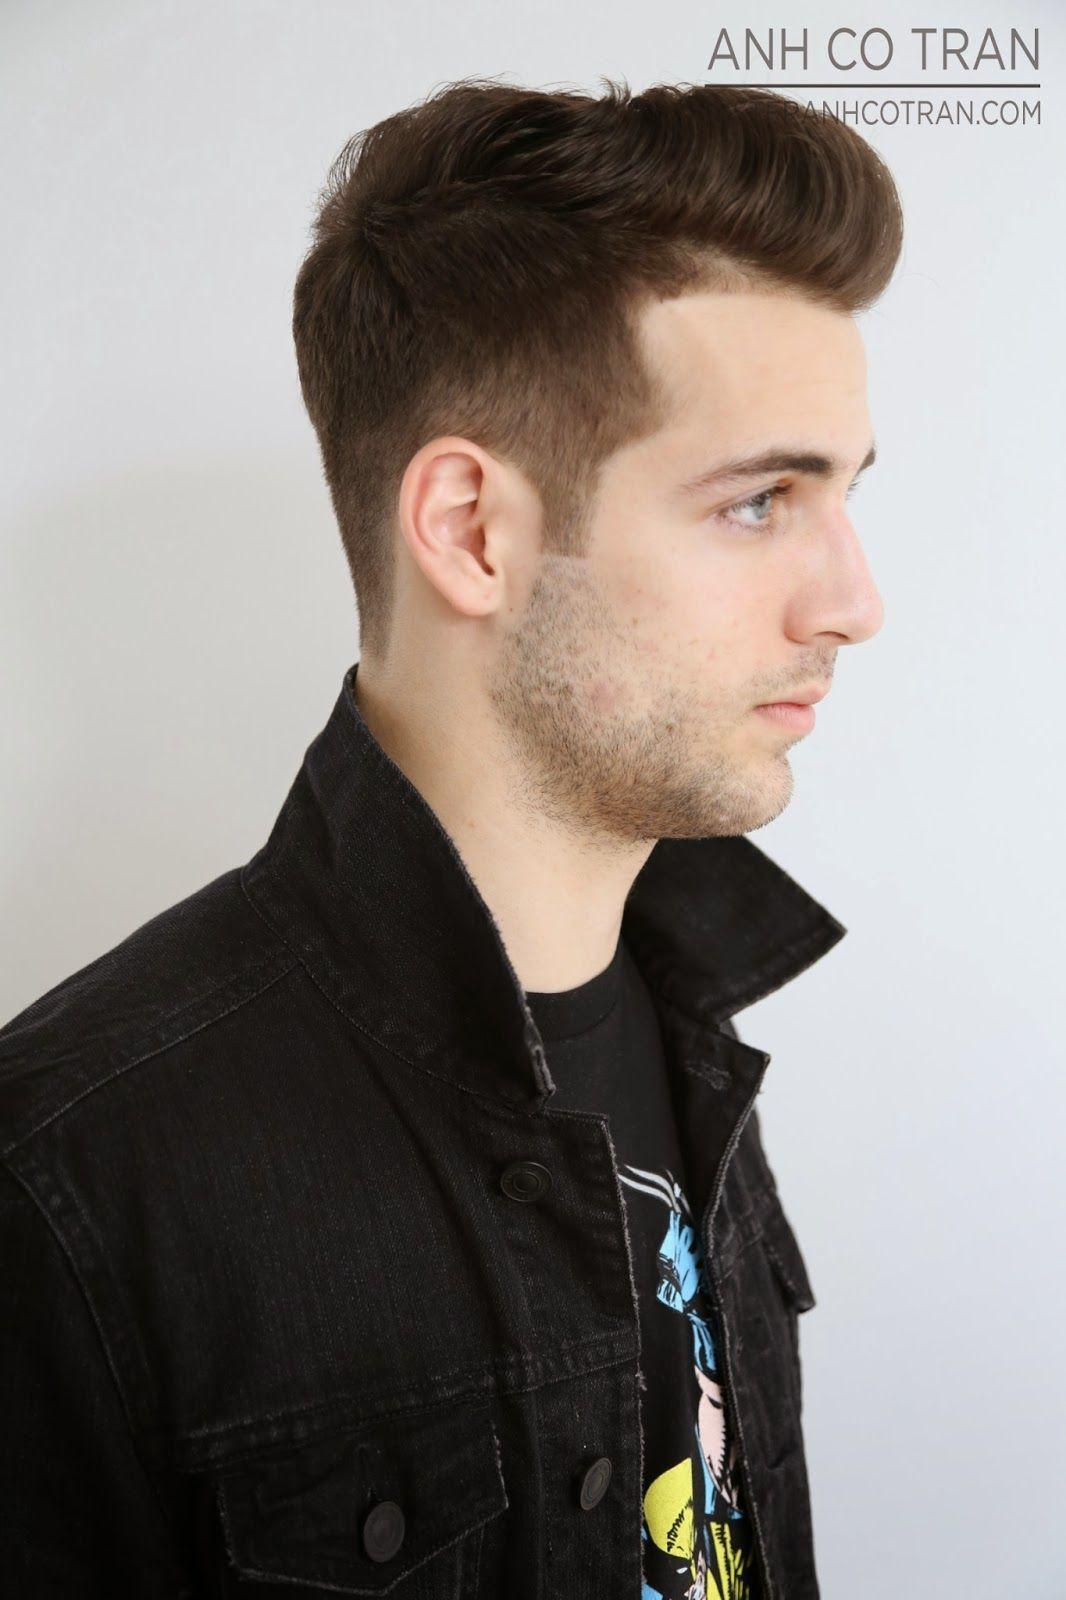 La A James Dean Esque Mens Haircut At Ramireztran Cutstyle Anh